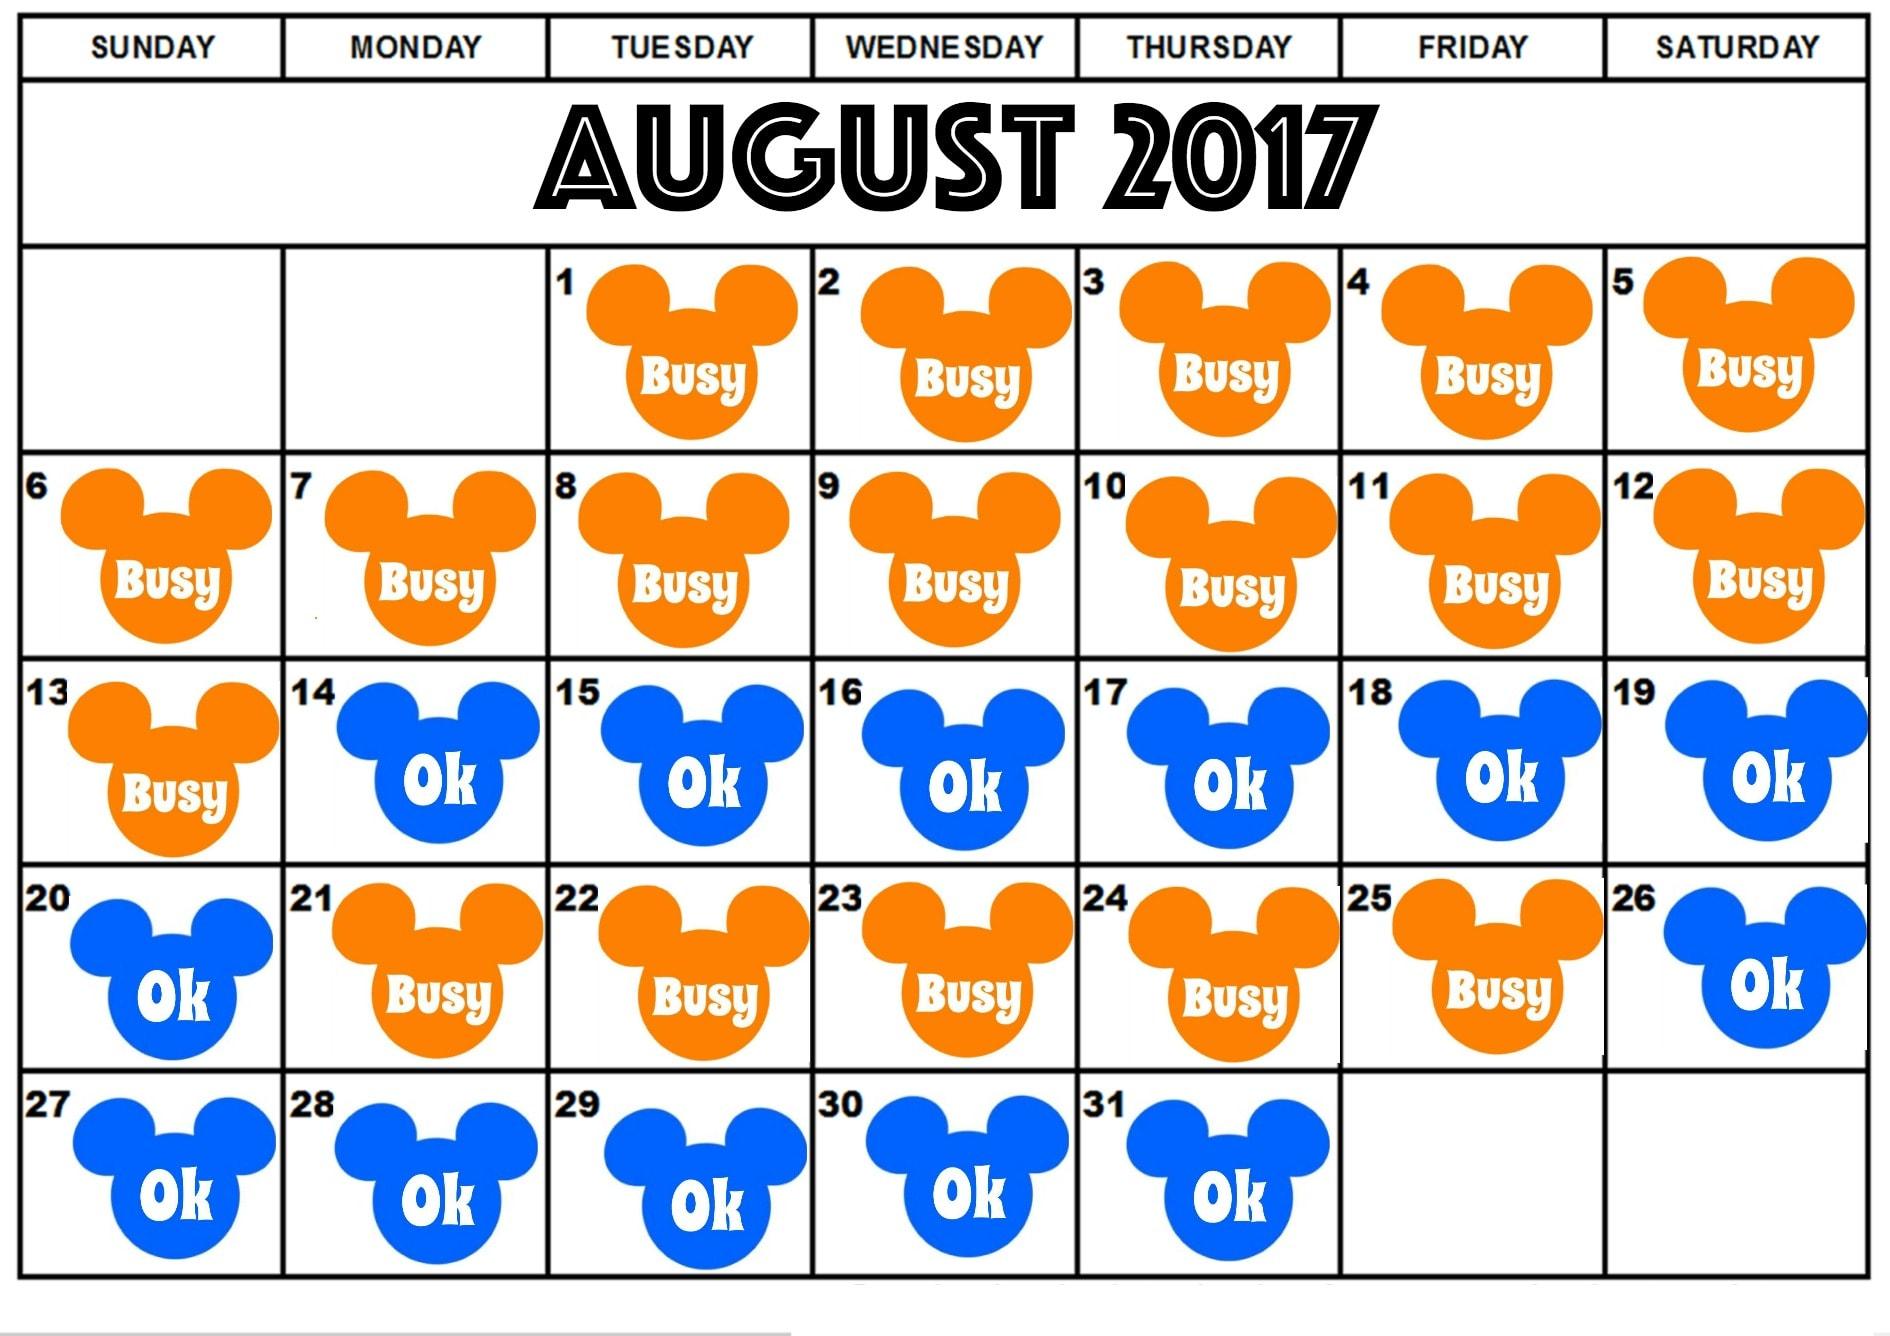 Disneyland August Crowd Calendar